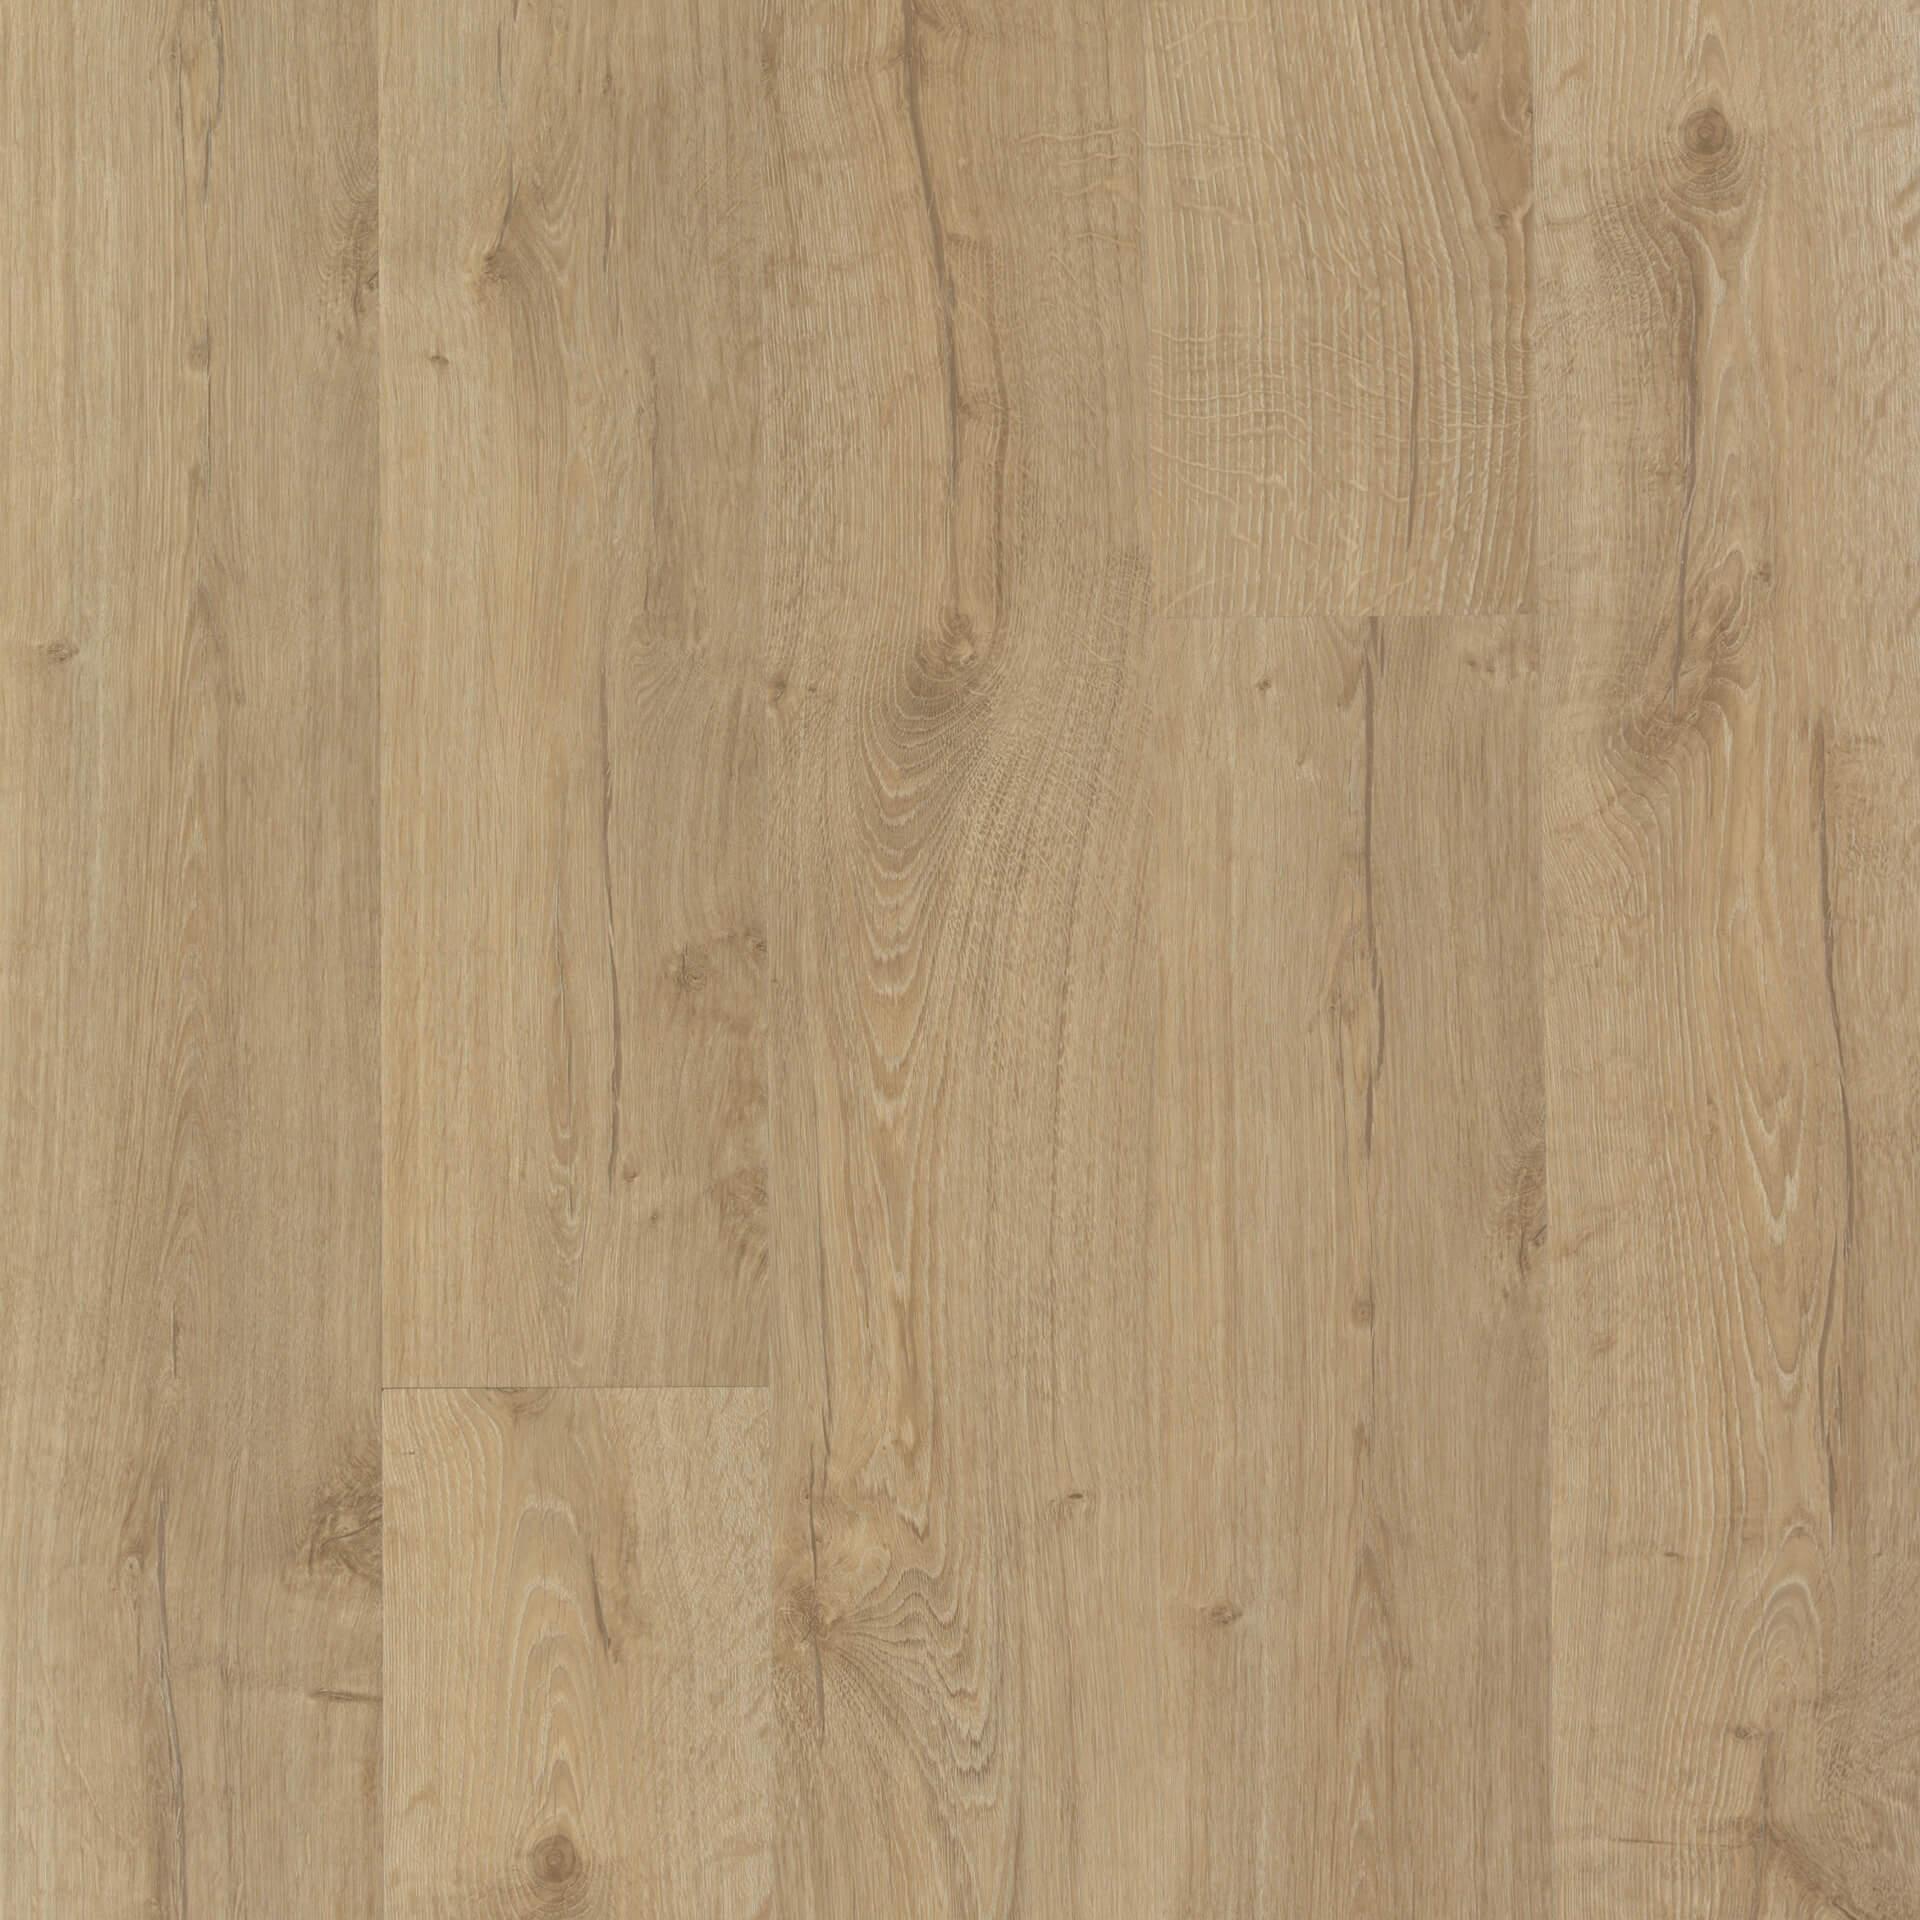 Wheat Oak Natrona Collection Laminate